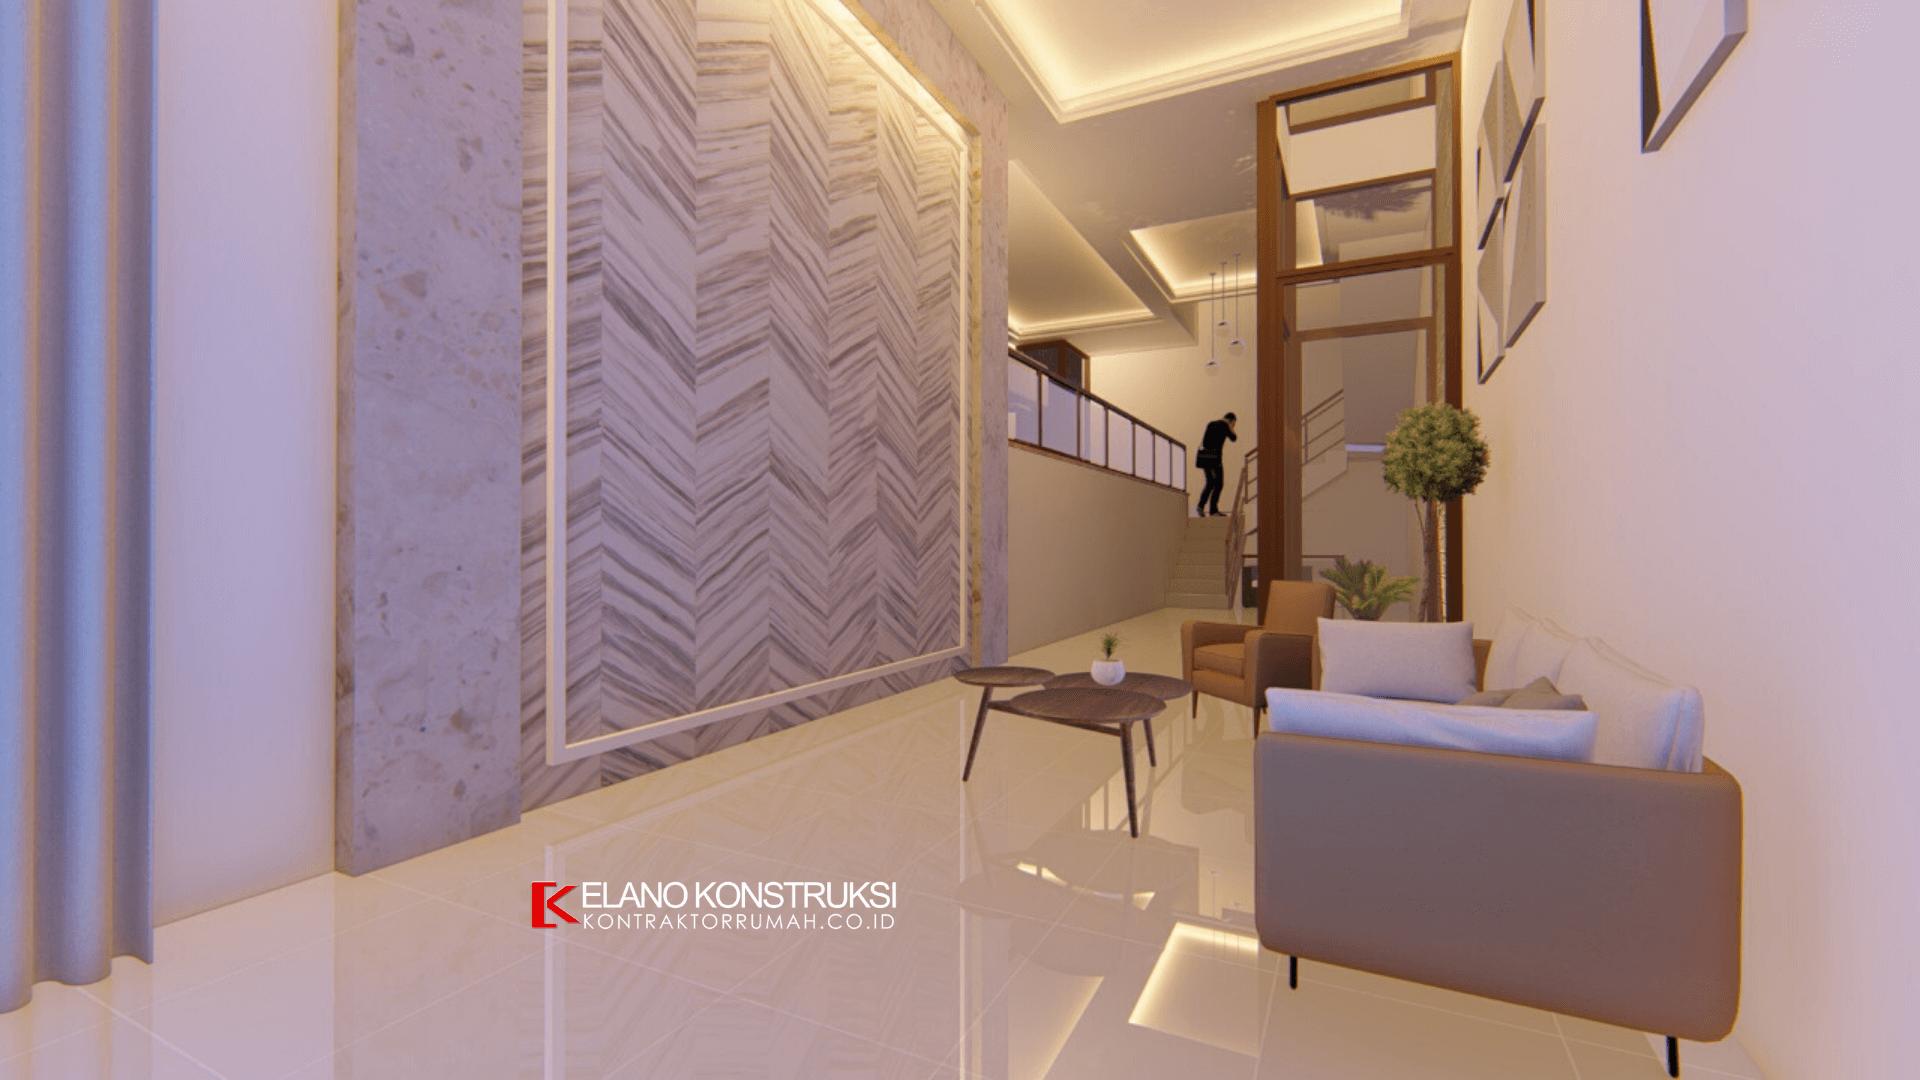 2 - Desain Rumah Kontemporer Modern Bapak Yan 230 M2 Jakarta